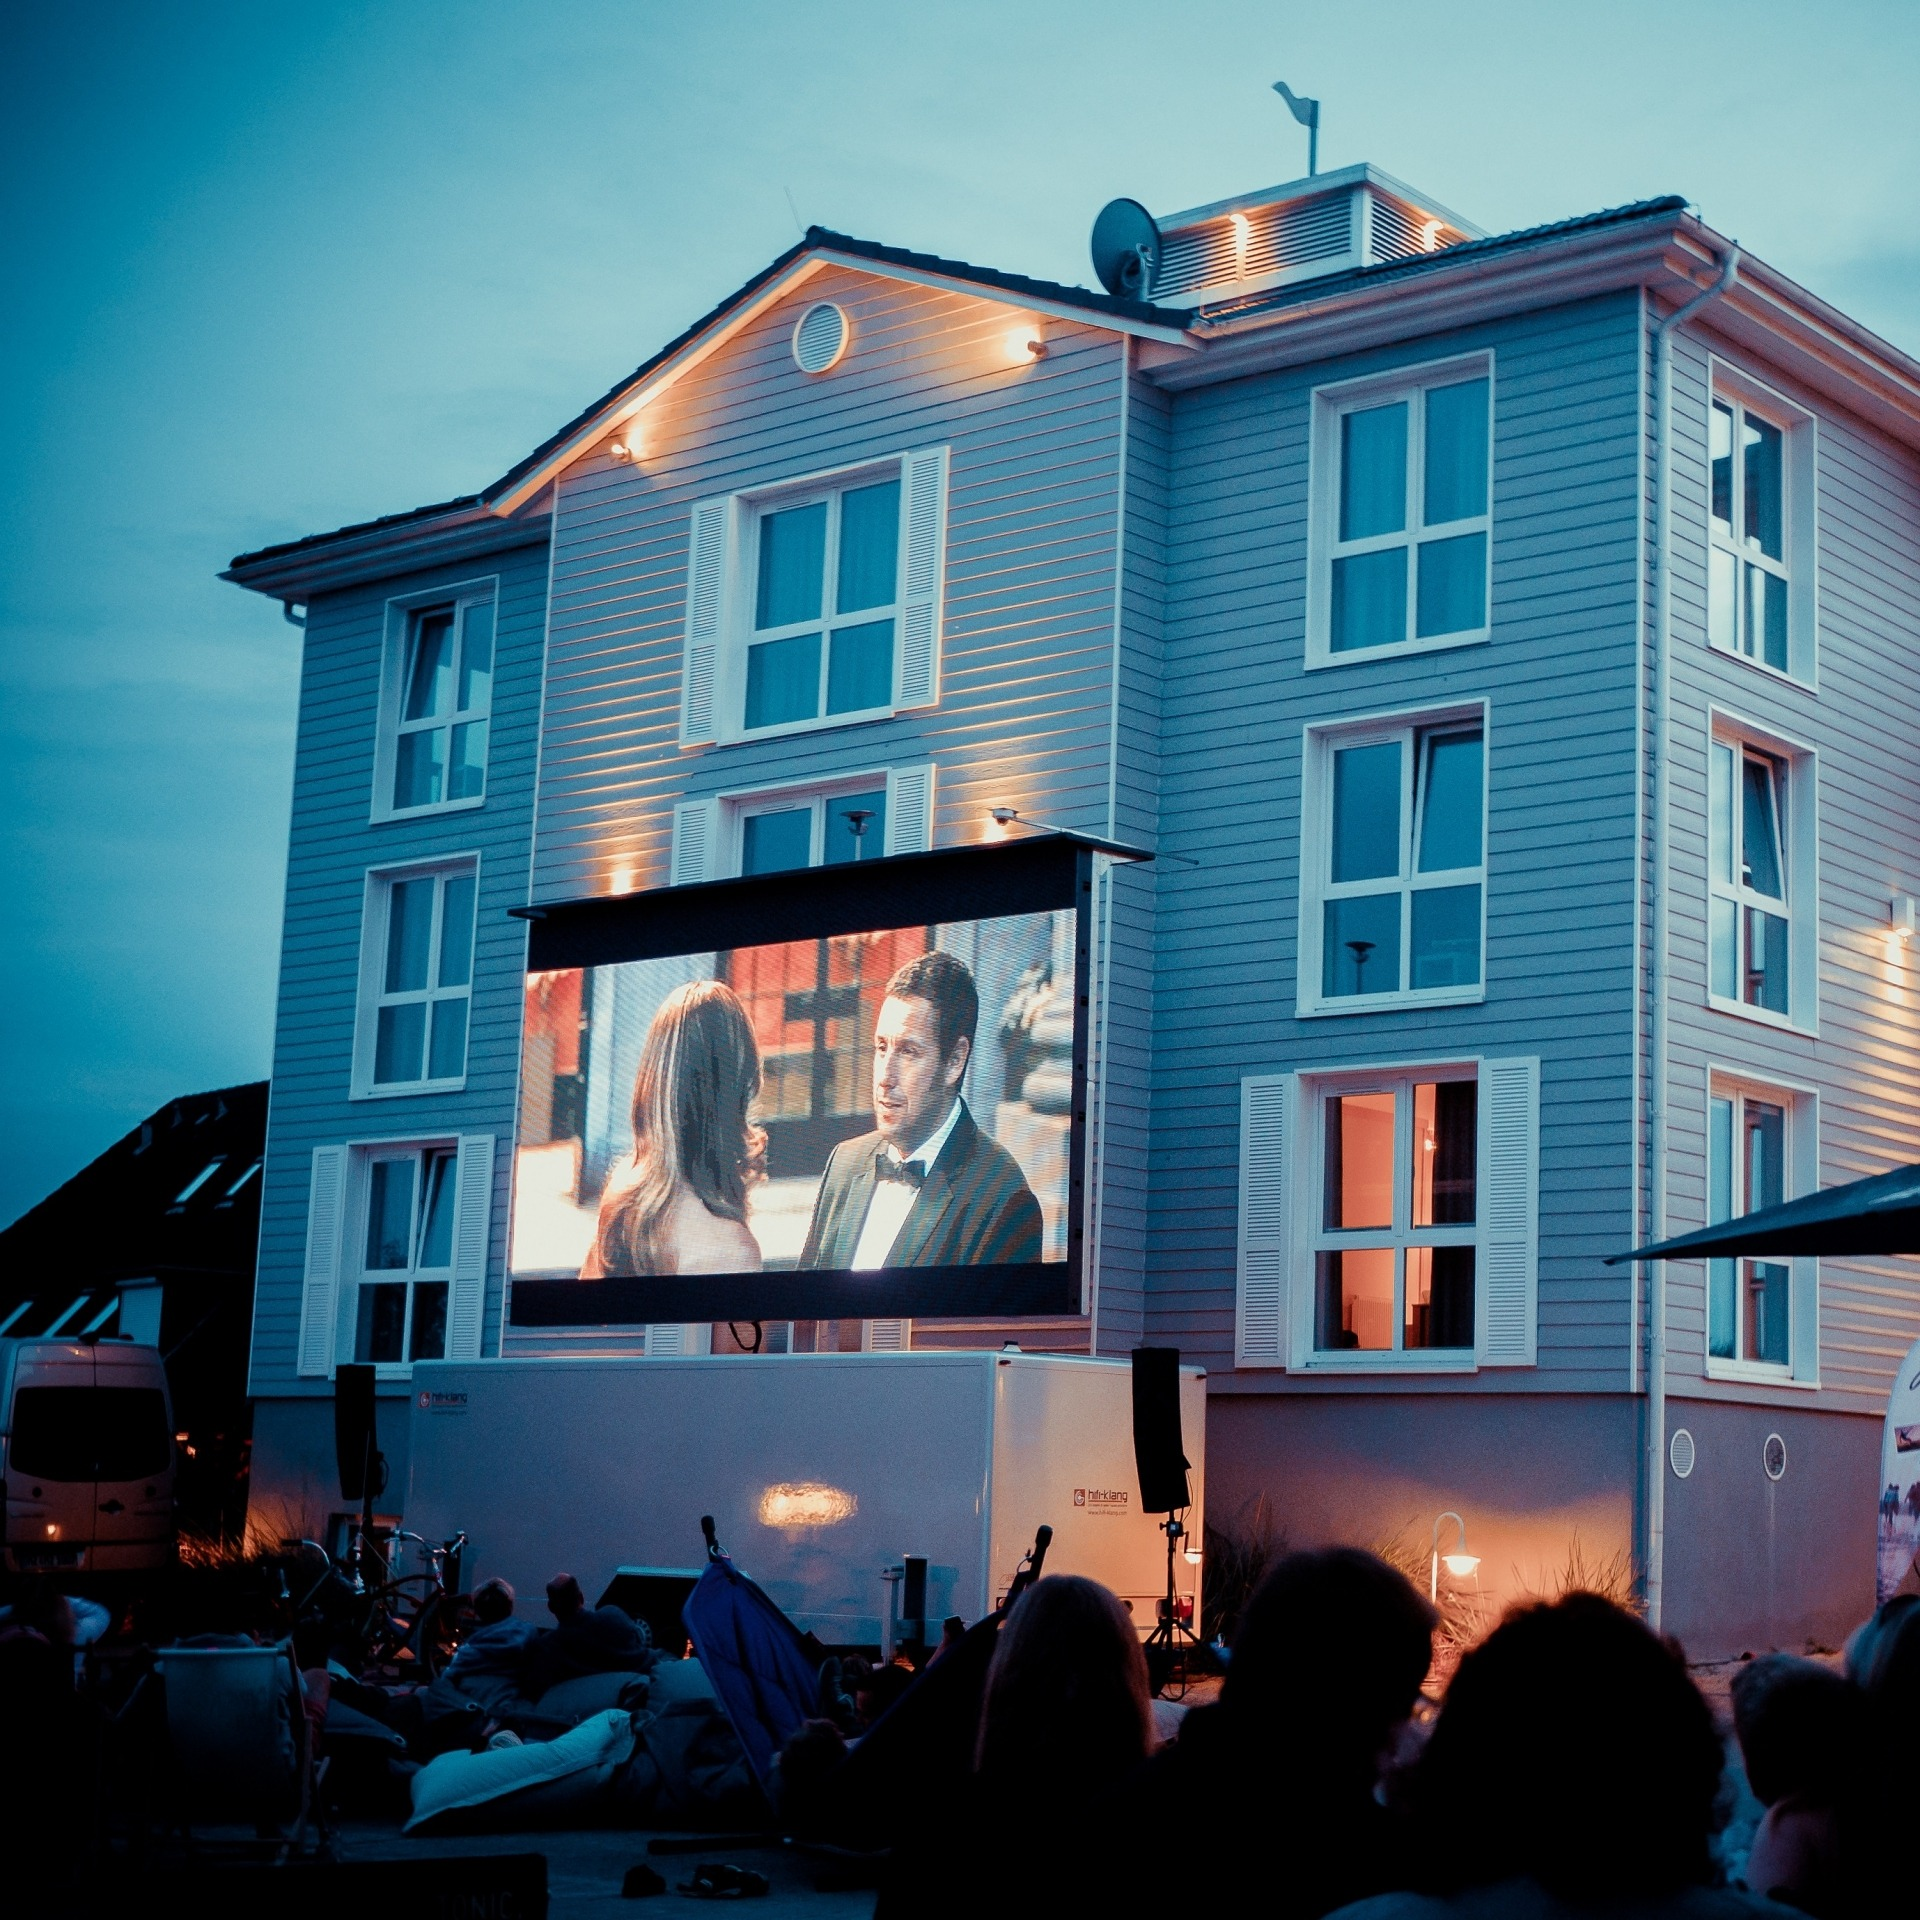 beach motel sommerfest beach motel st peter ording. Black Bedroom Furniture Sets. Home Design Ideas